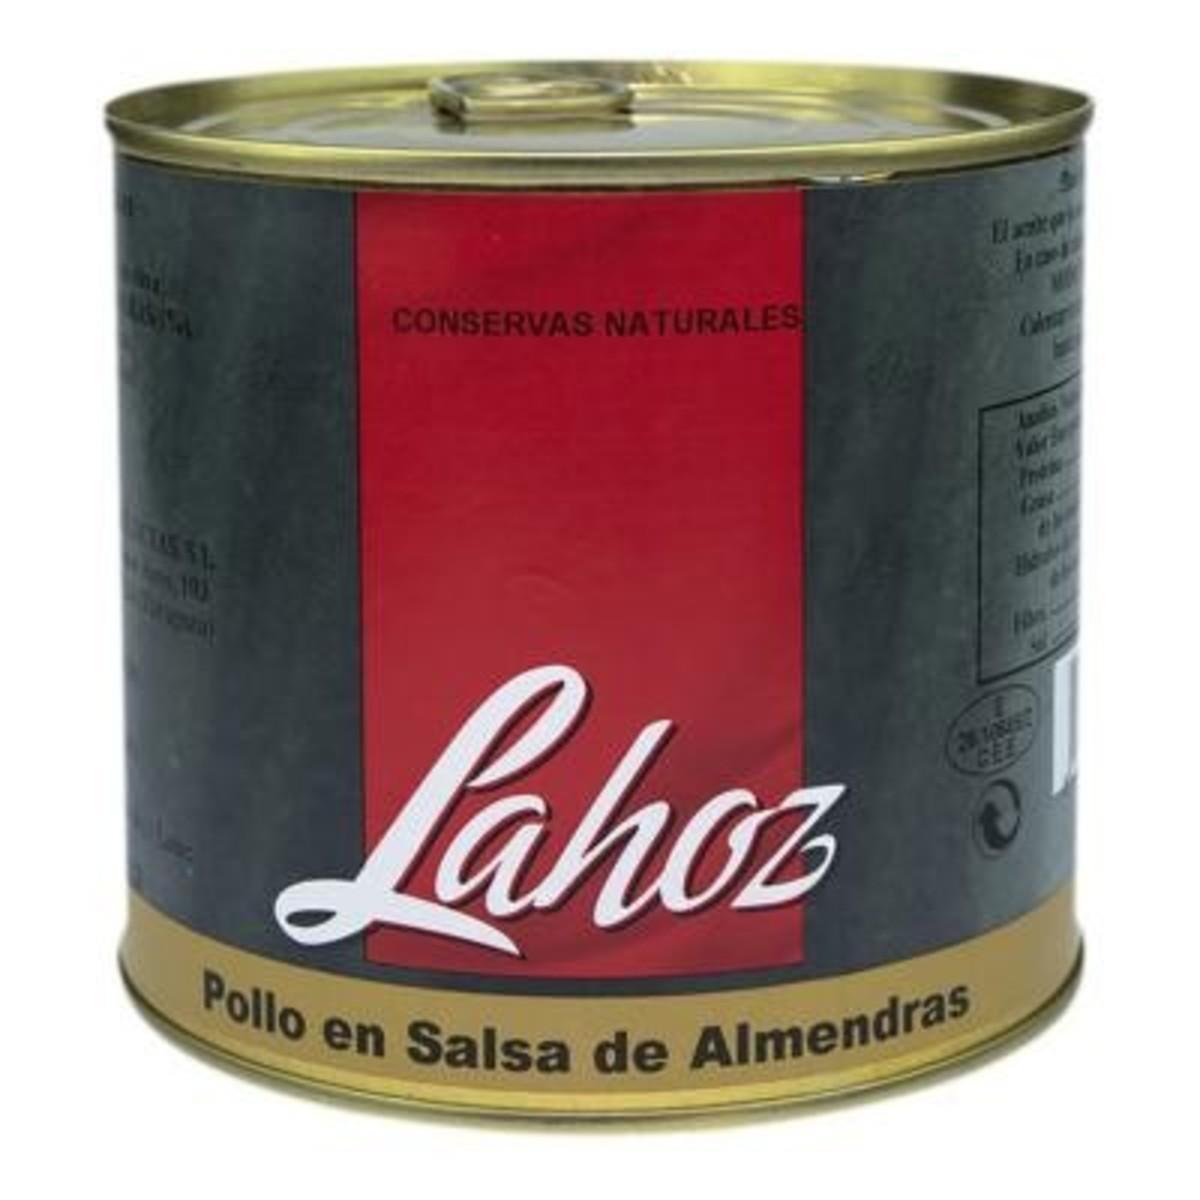 Pollo en salsa de almendras Lahoz